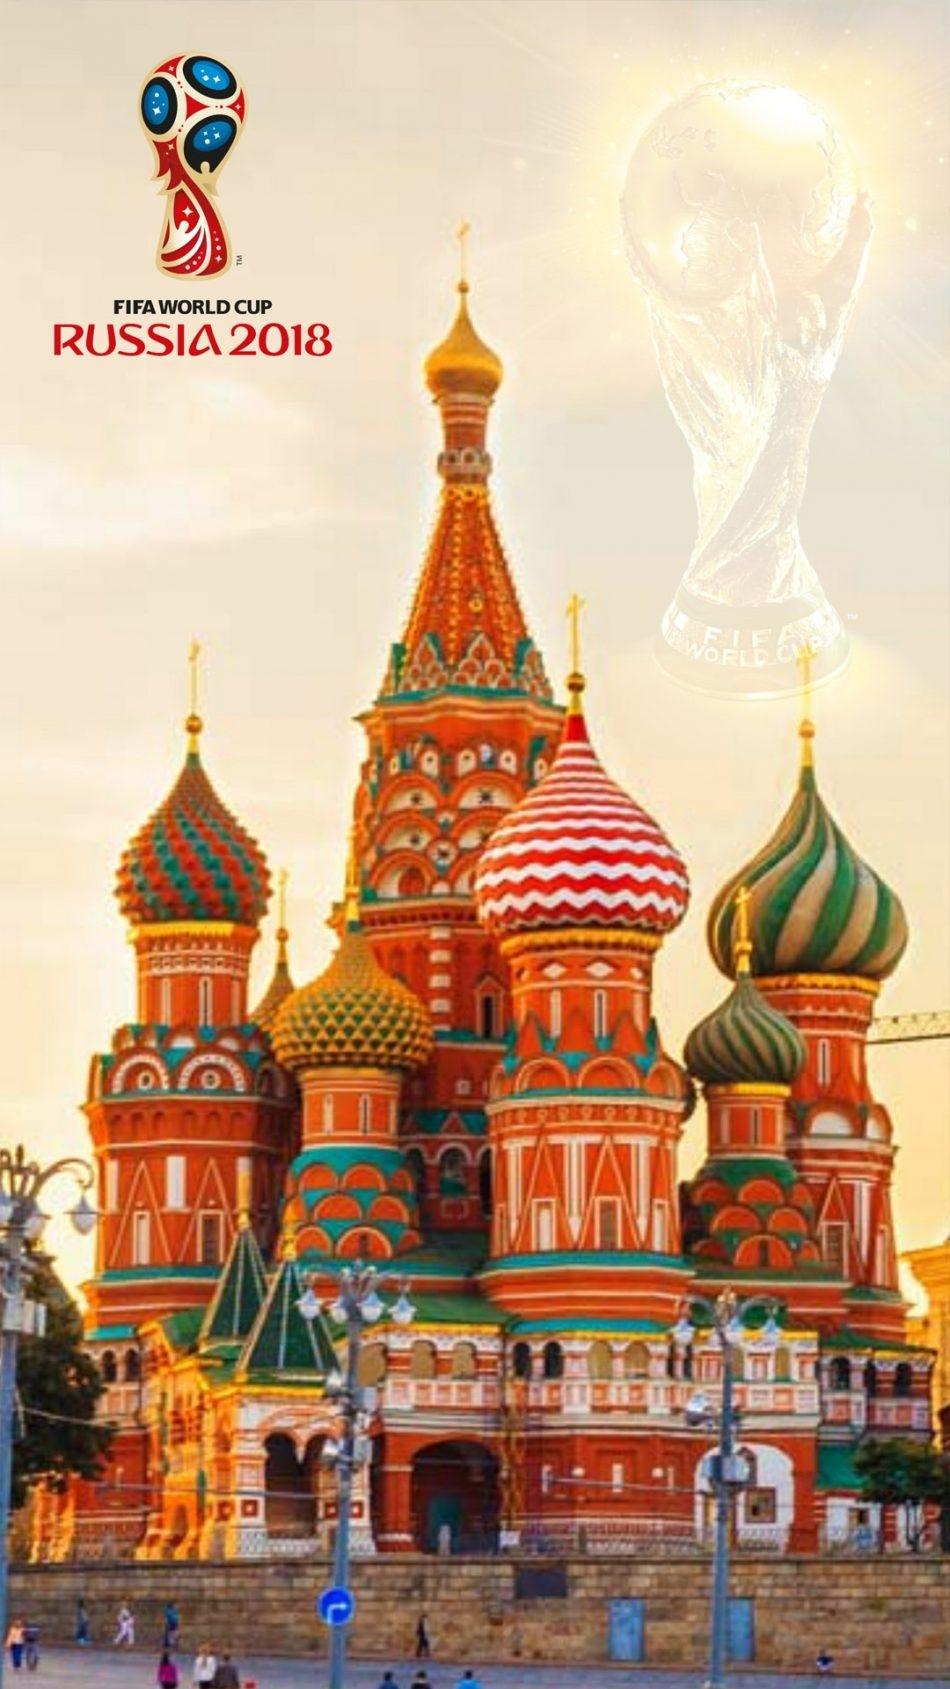 Fifa World Cup 2018 Hd Wallpapers - Saint Basil's Cathedral - HD Wallpaper